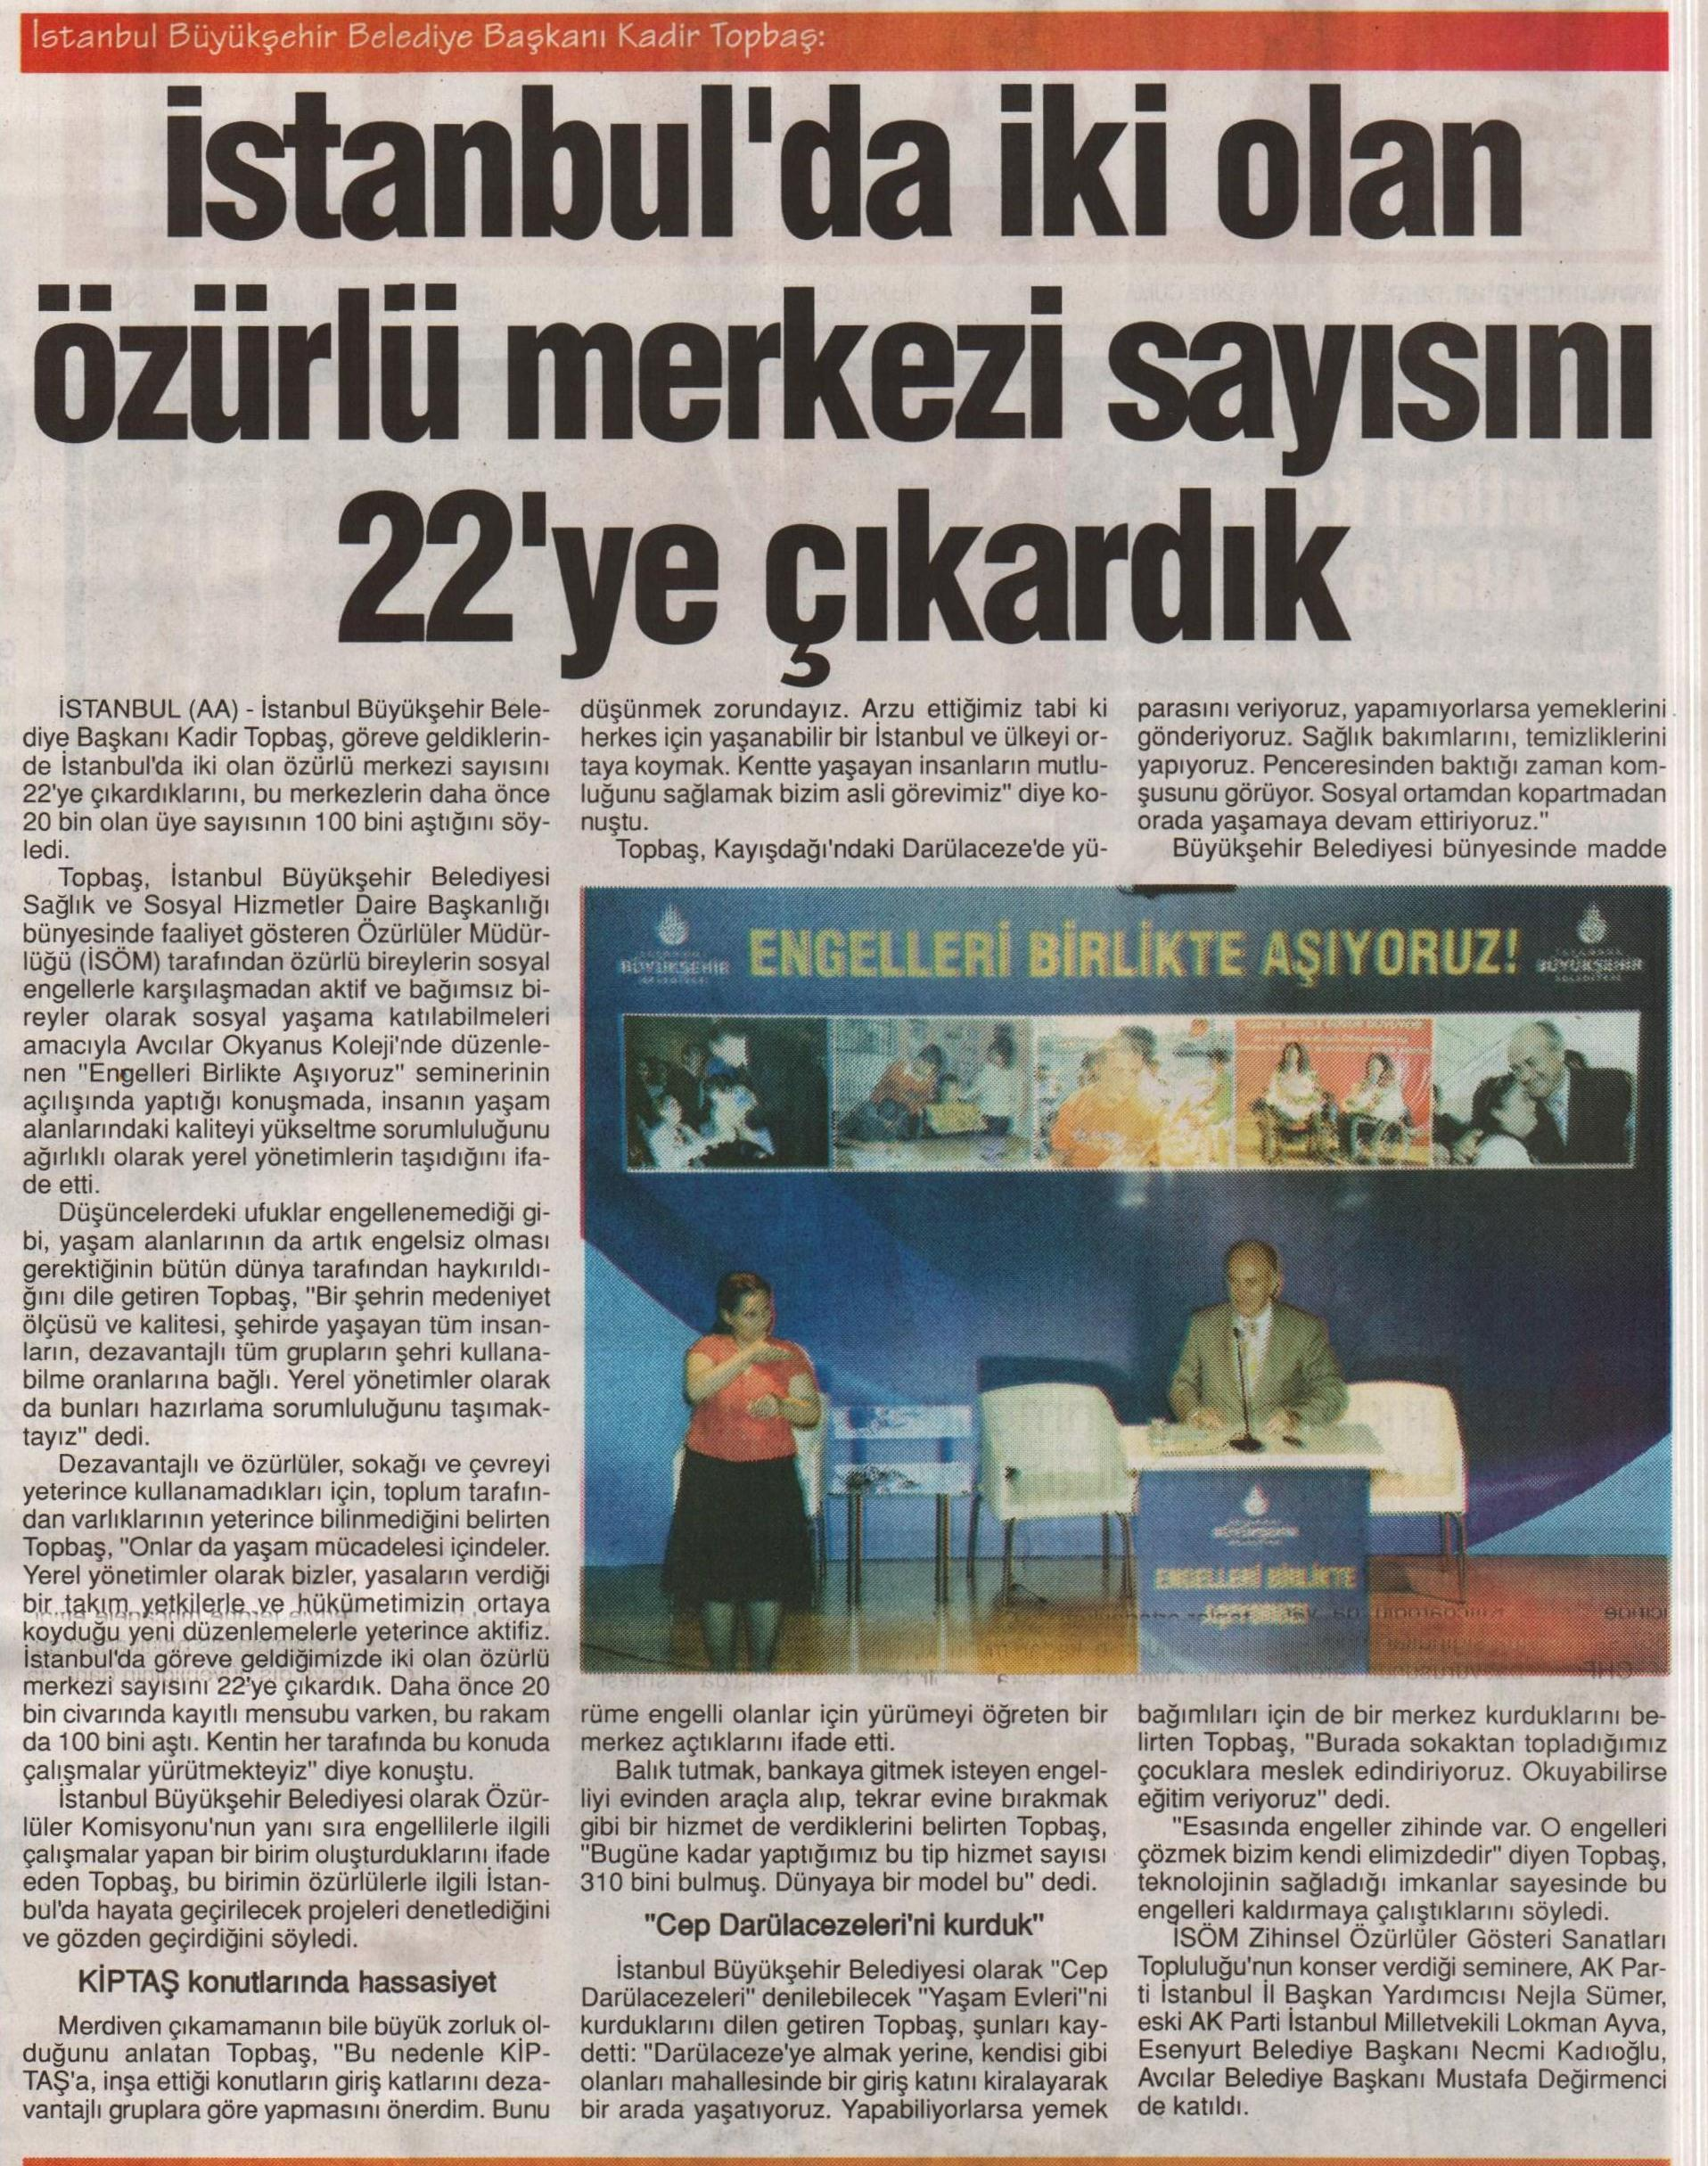 04.05.2012_once_vatan_ozurlu